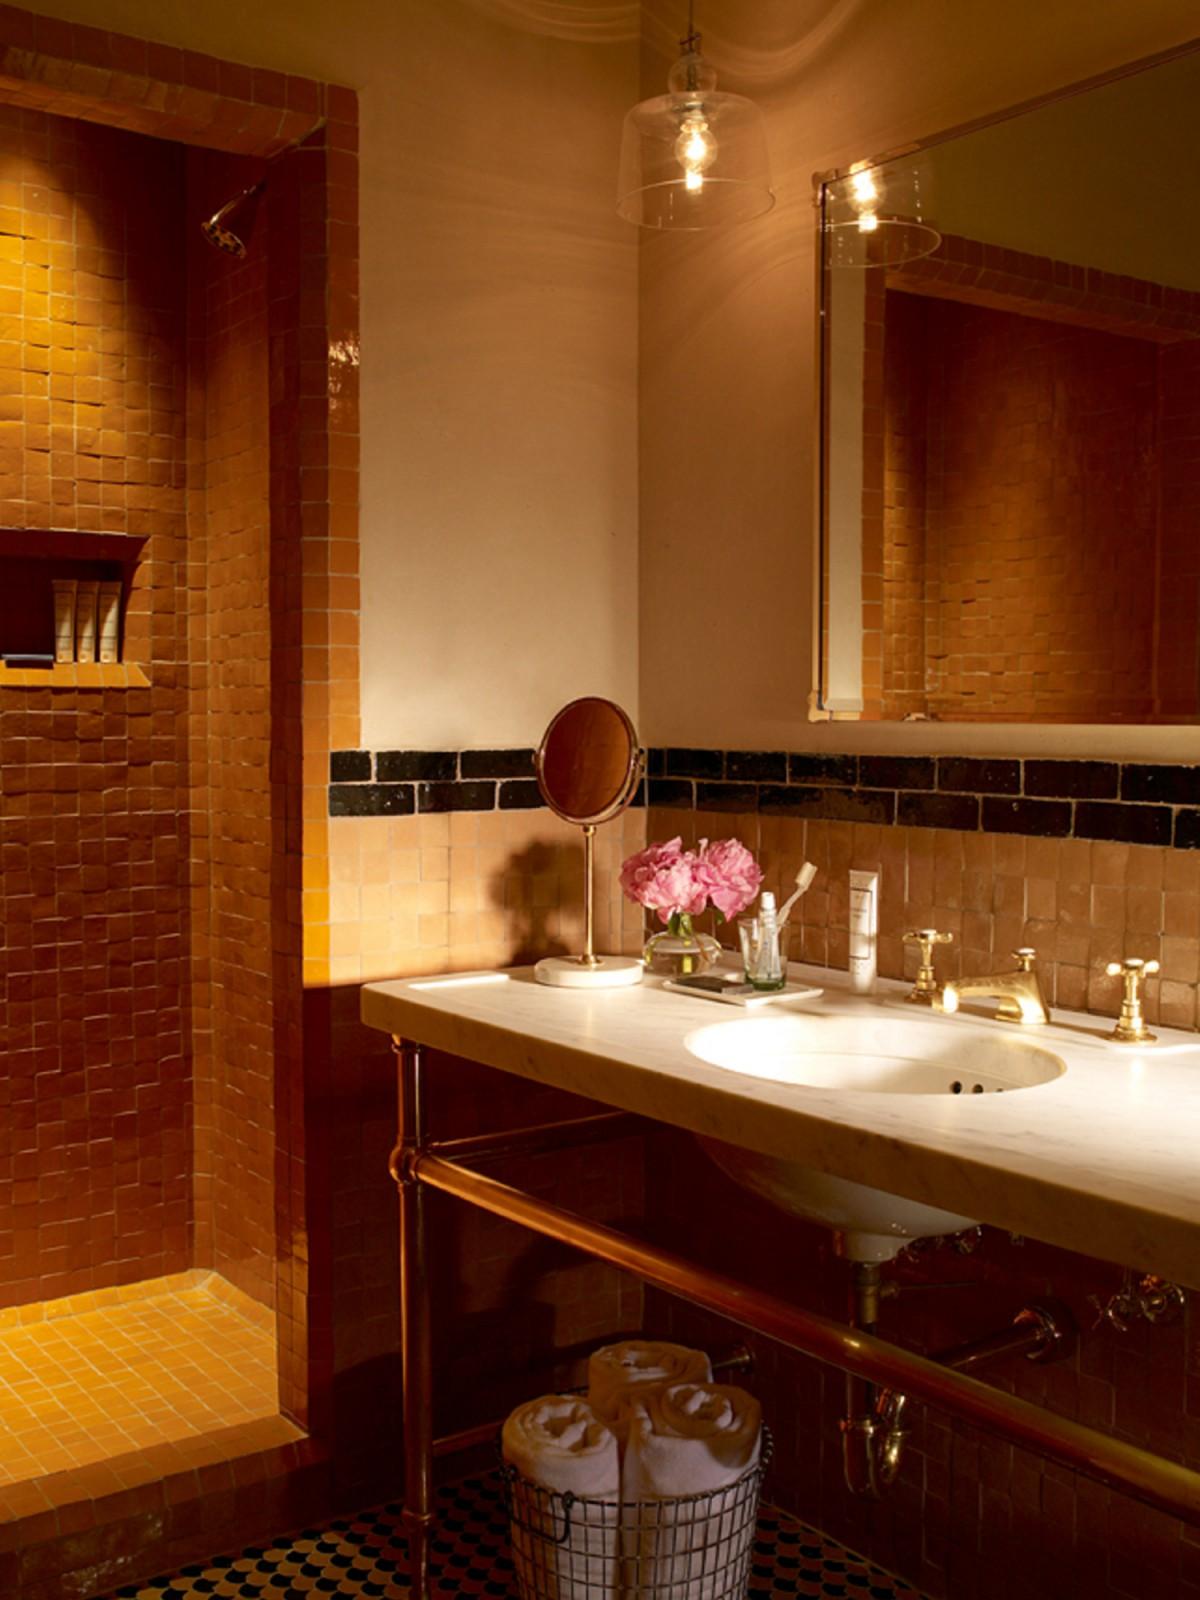 Bathroom detail in the Courtyard Queen Room